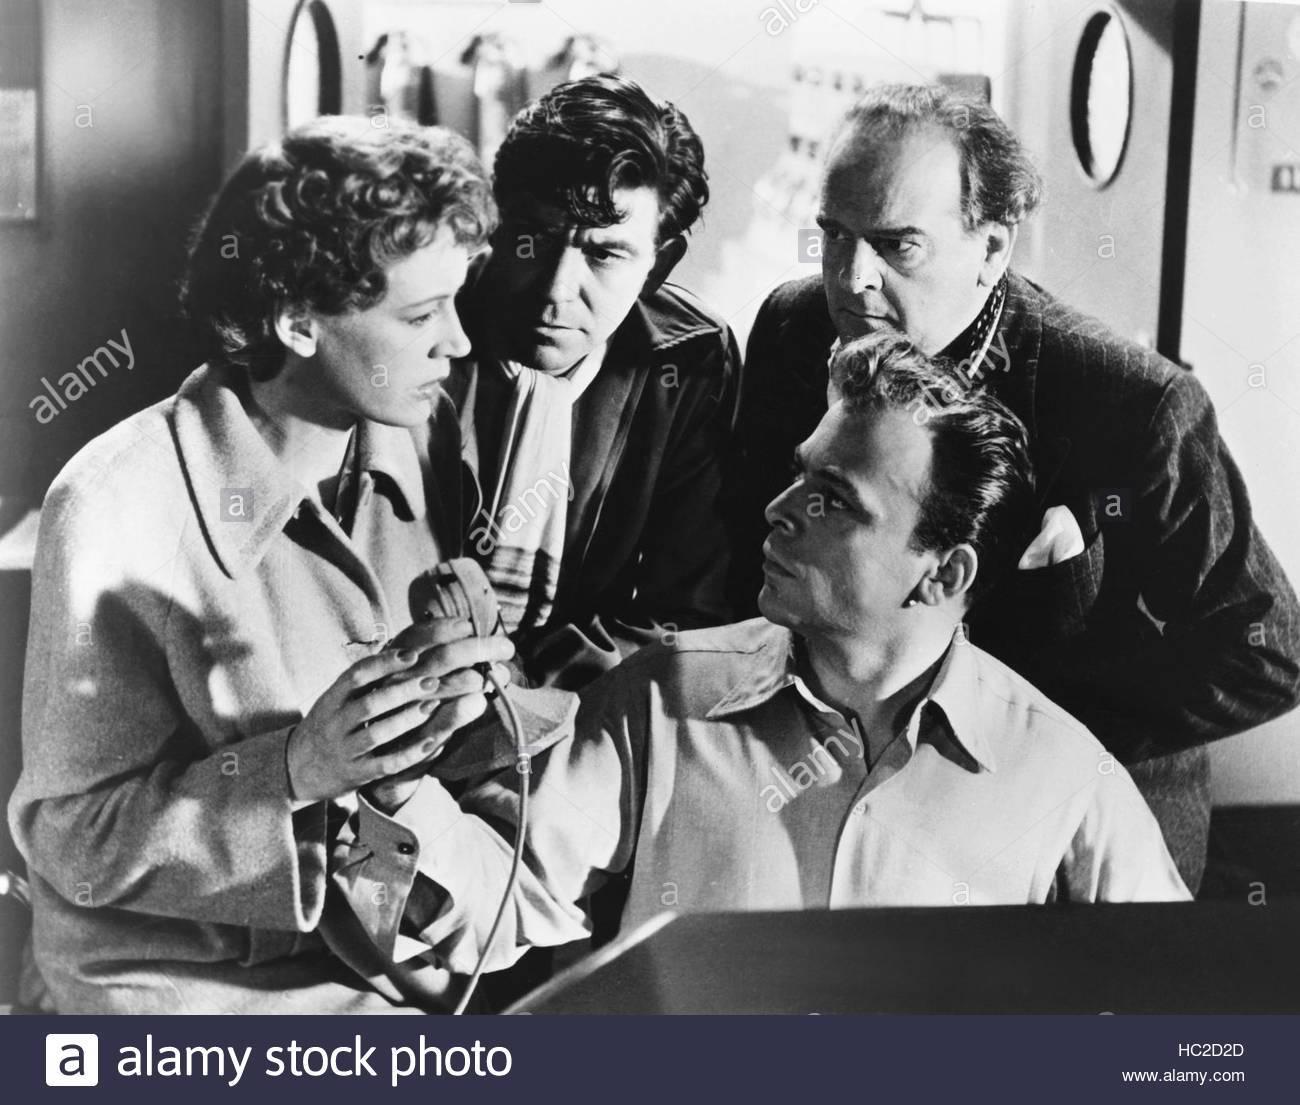 The Net (1953)